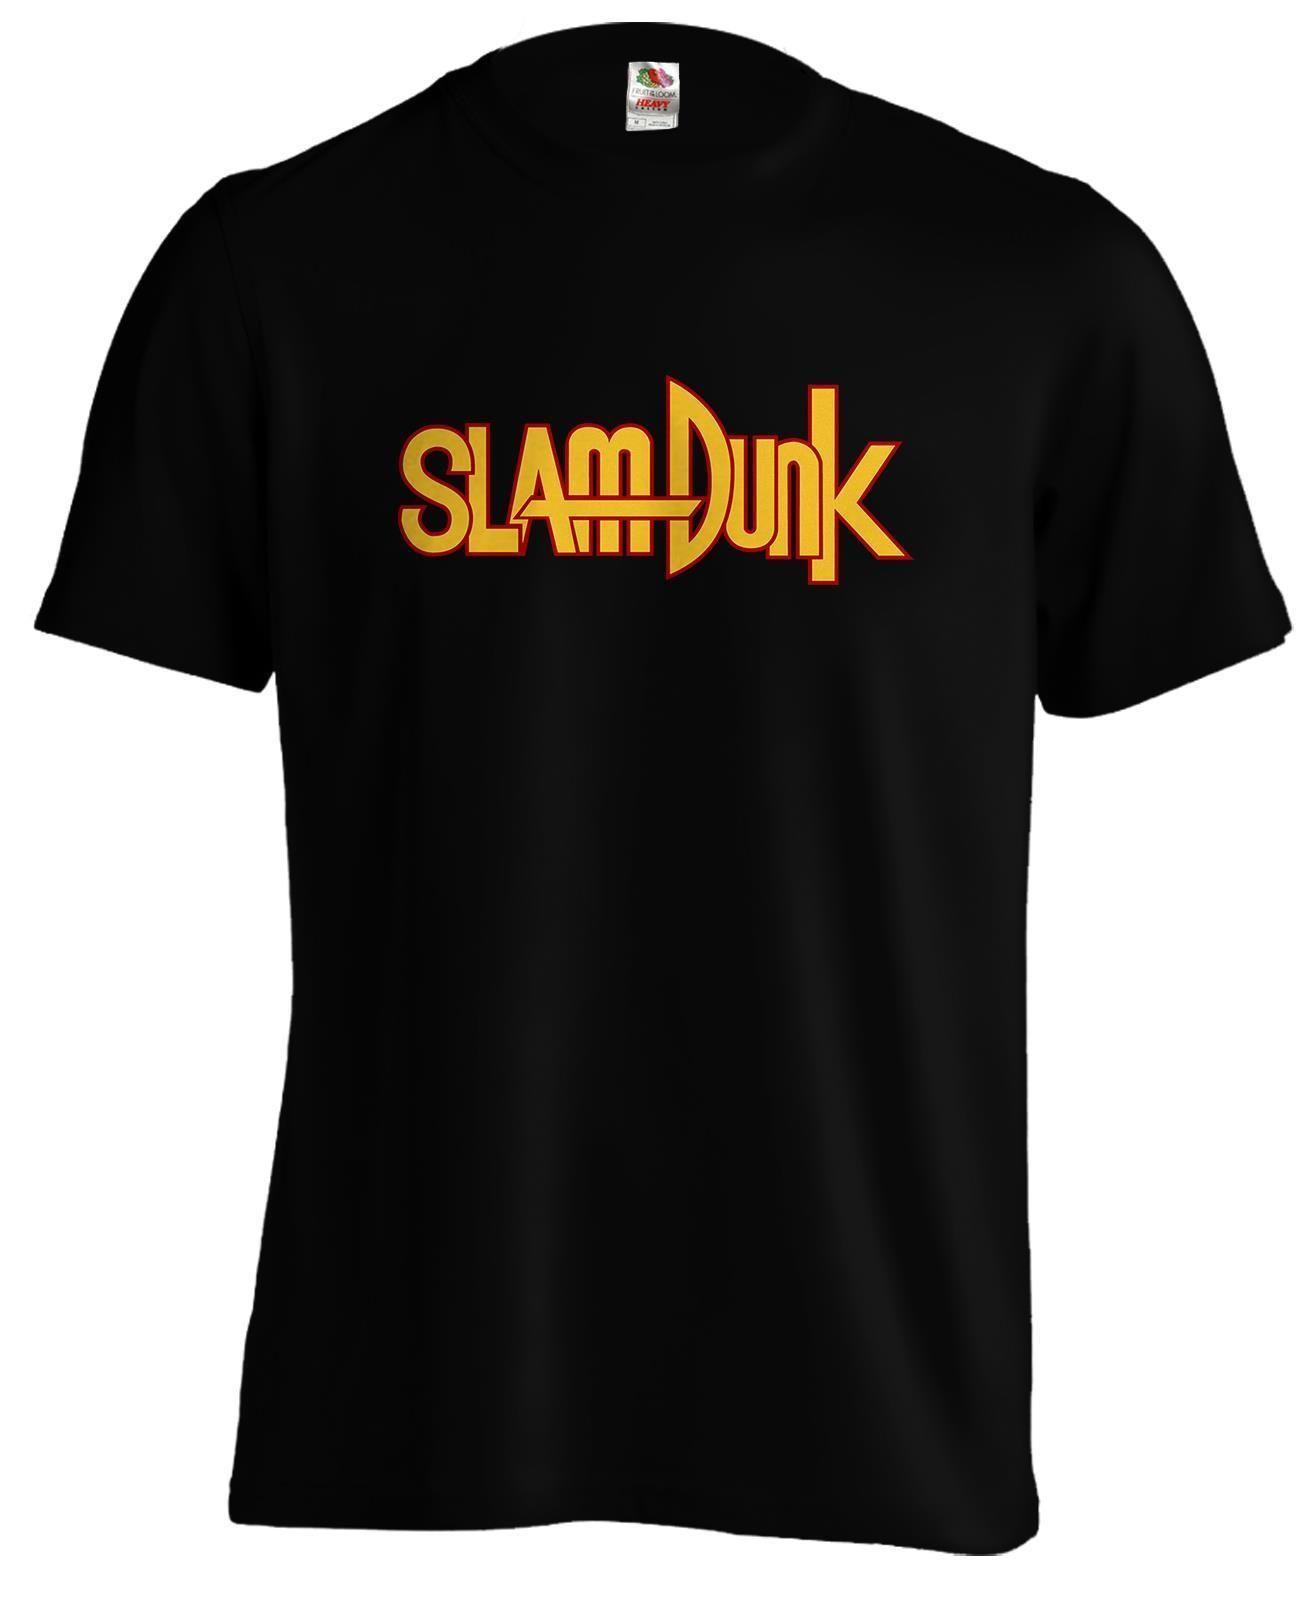 huge selection of c9261 41edf Großhandel Slam Dunk Basketball Logo Anime Manga T Shirt Weißes Schwarzes  Graues Rotes Hosen T Shirt Anzughut Rosa T Shirt RETRO VINTAGE Klassisches  T Shirt ...